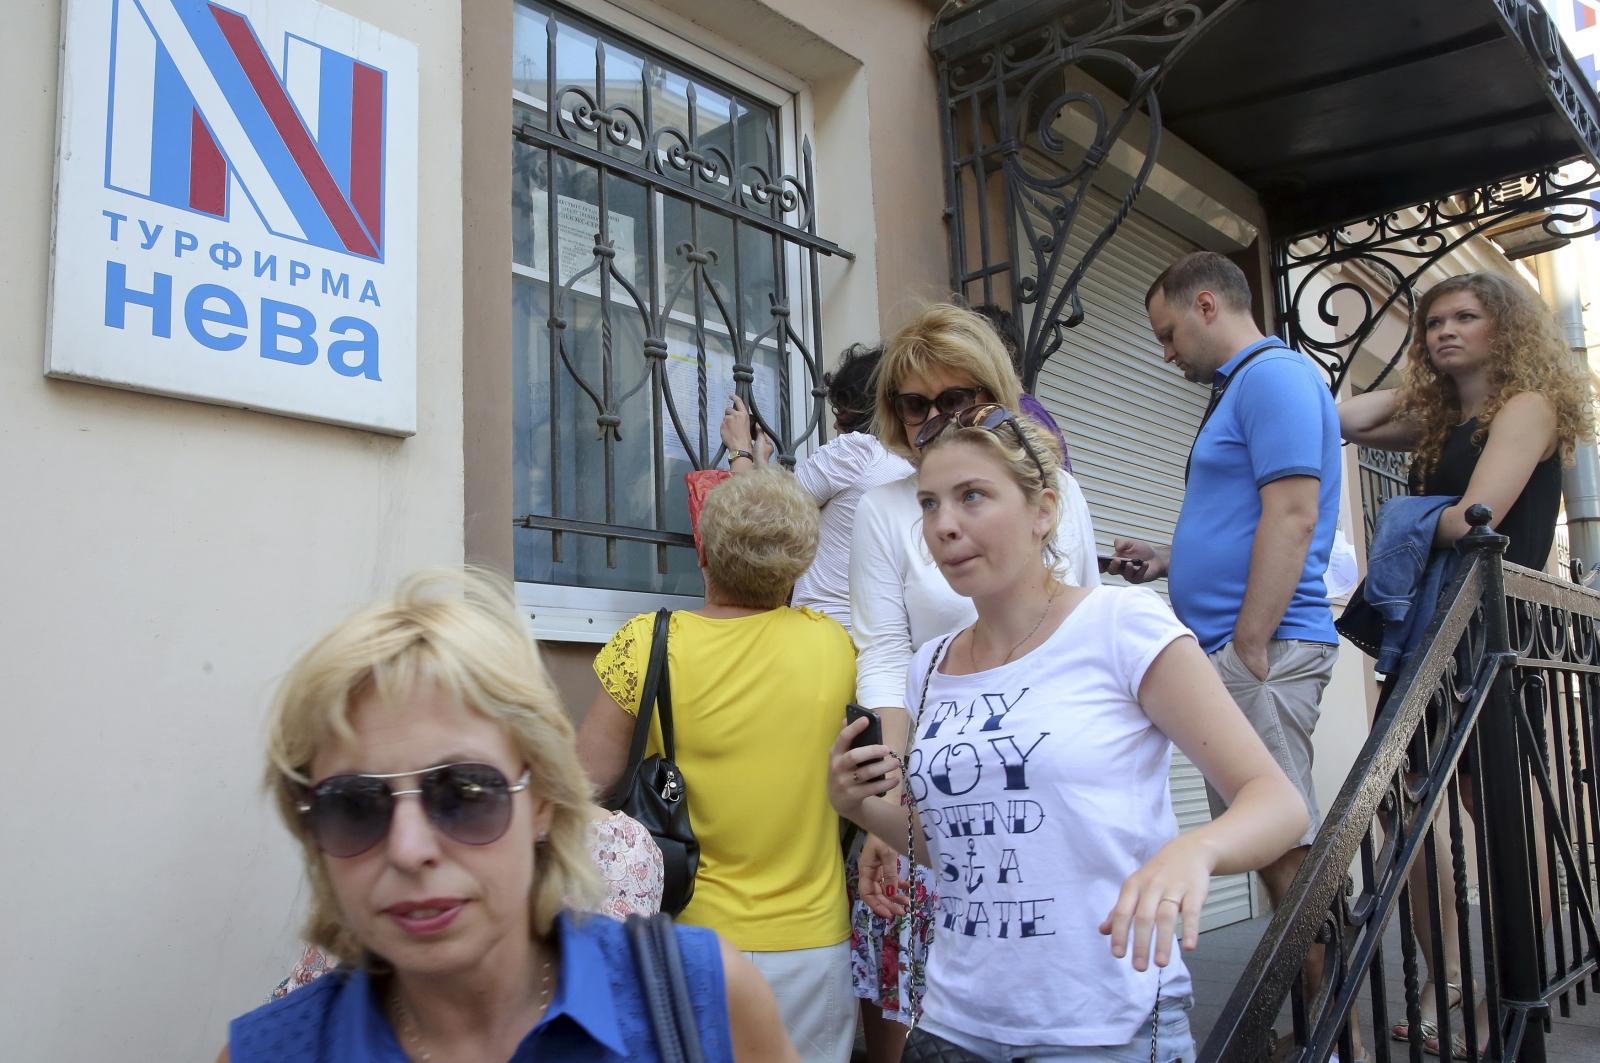 Russia tourists